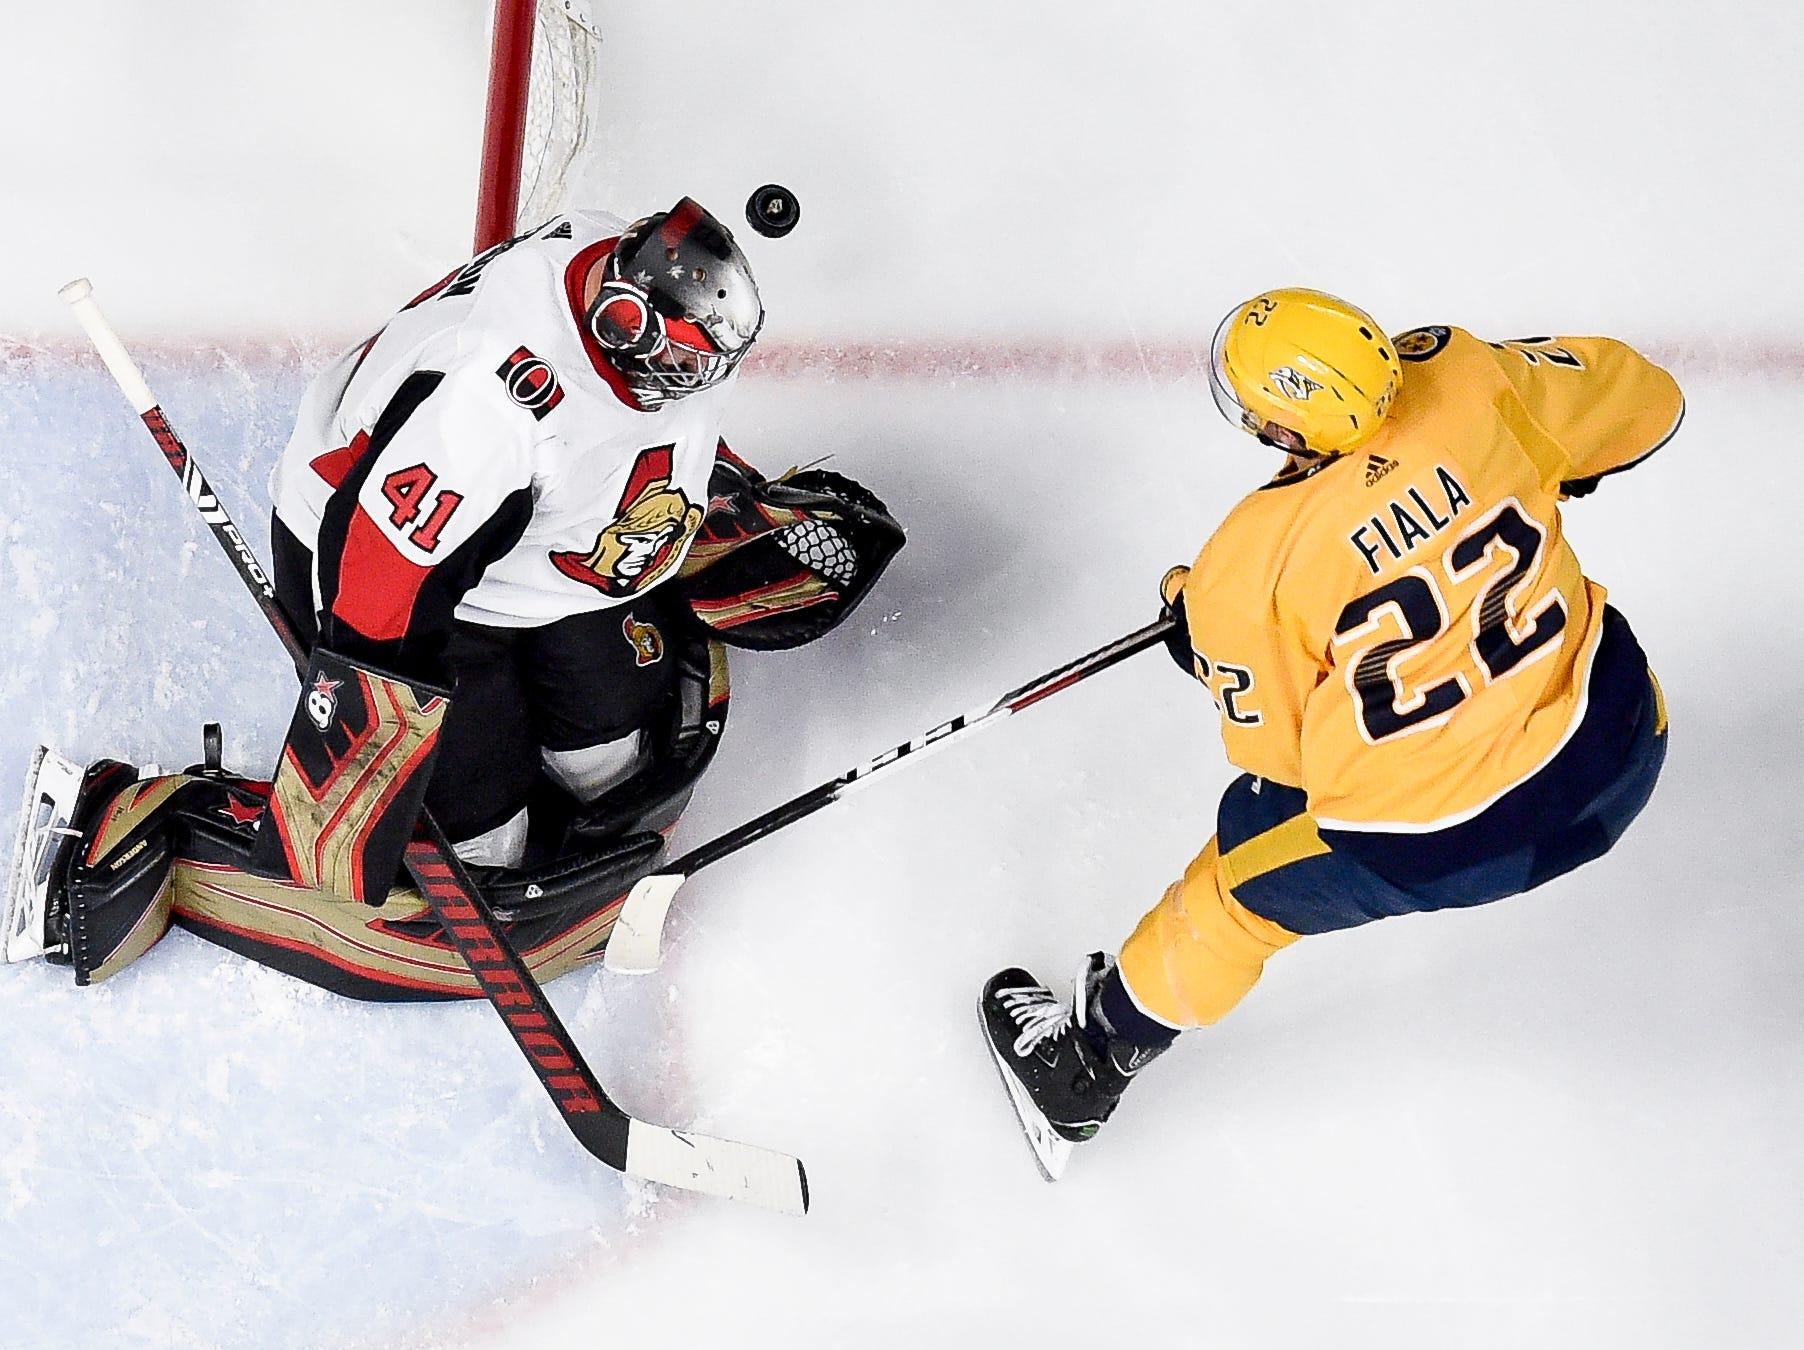 Nashville Predators left wing Kevin Fiala (22) battles Ottawa Senators goaltender Craig Anderson (41) during the second period at Bridgestone Arena in Nashville, Tenn., Tuesday, Dec. 11, 2018.